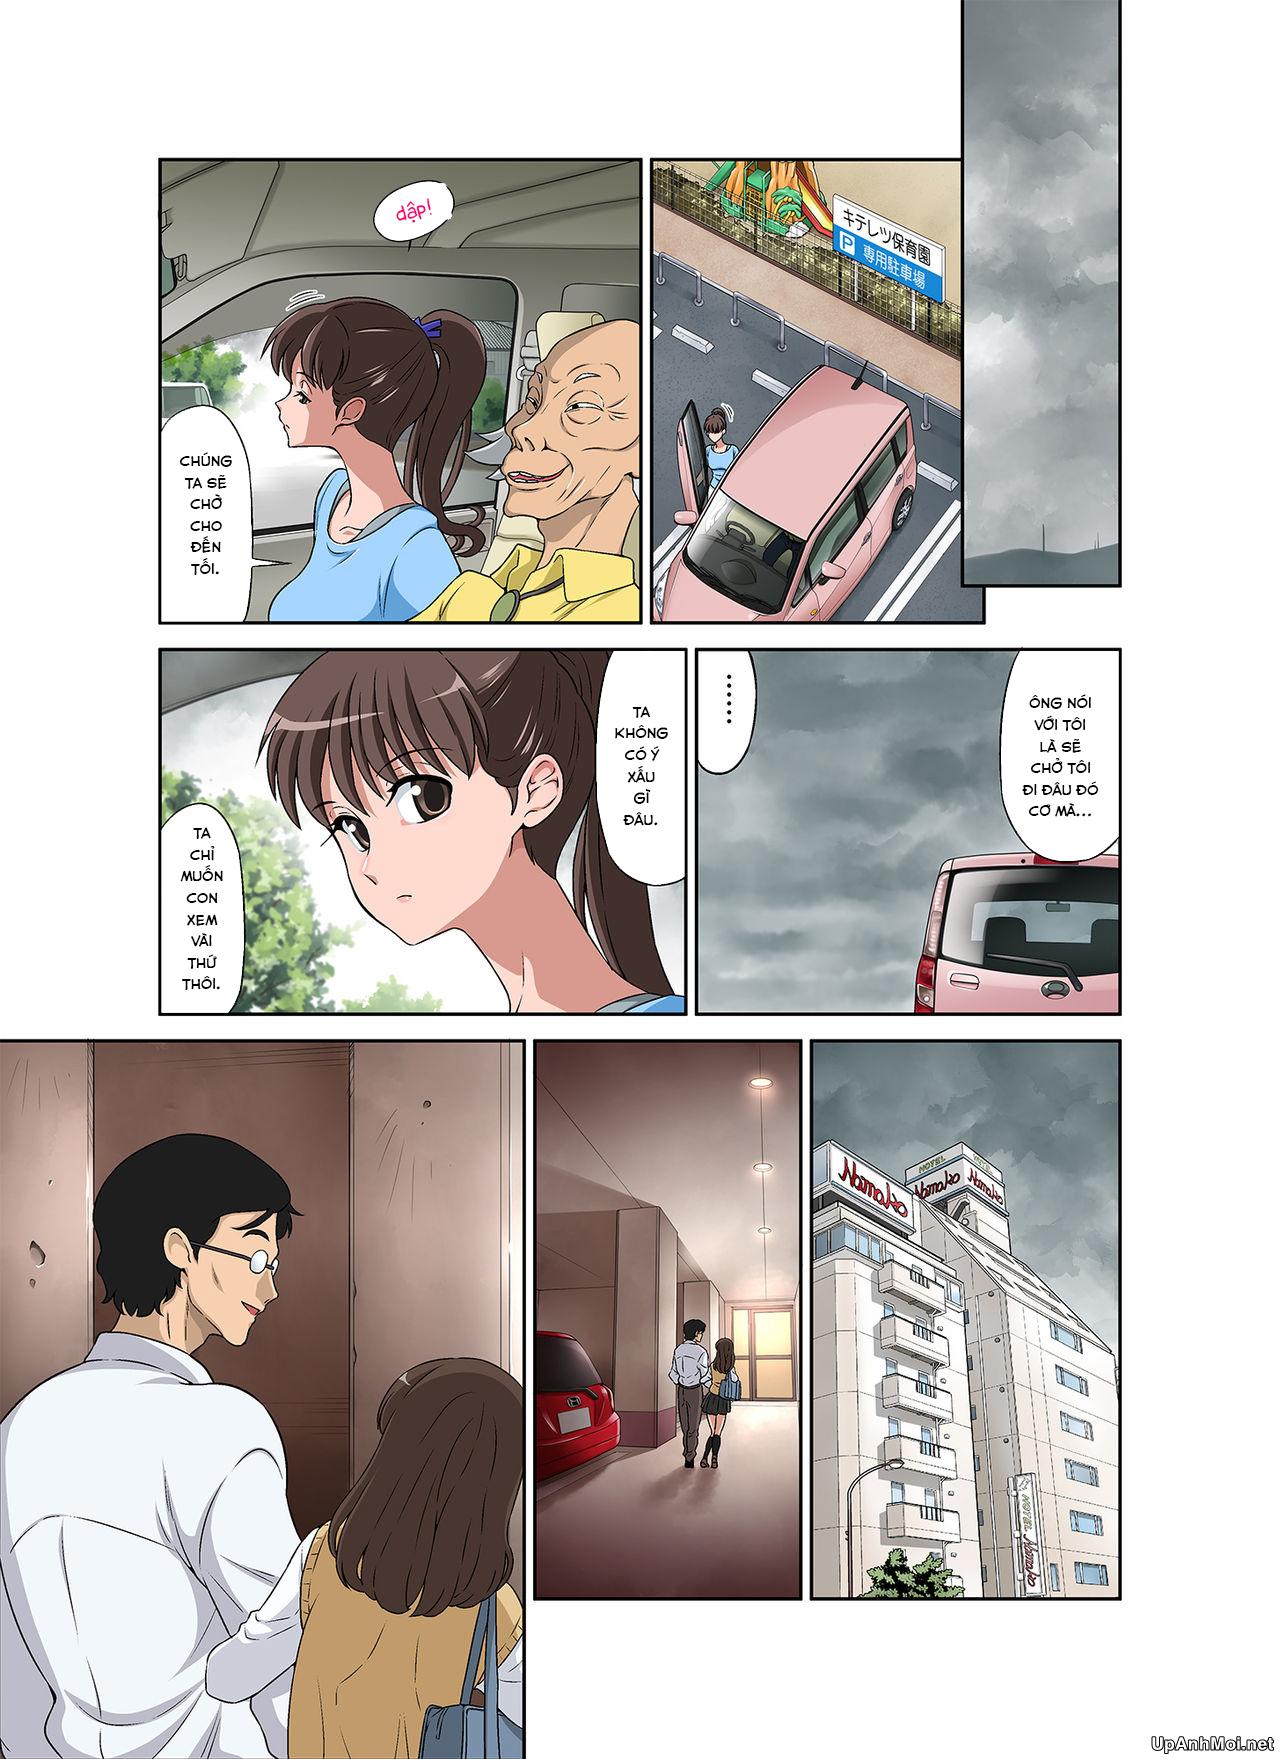 HentaiVN.net - Ảnh 34 - Shinmai Mama-san NTR - 新米ママさんNTR - Oneshot - Phiên bản da trắng